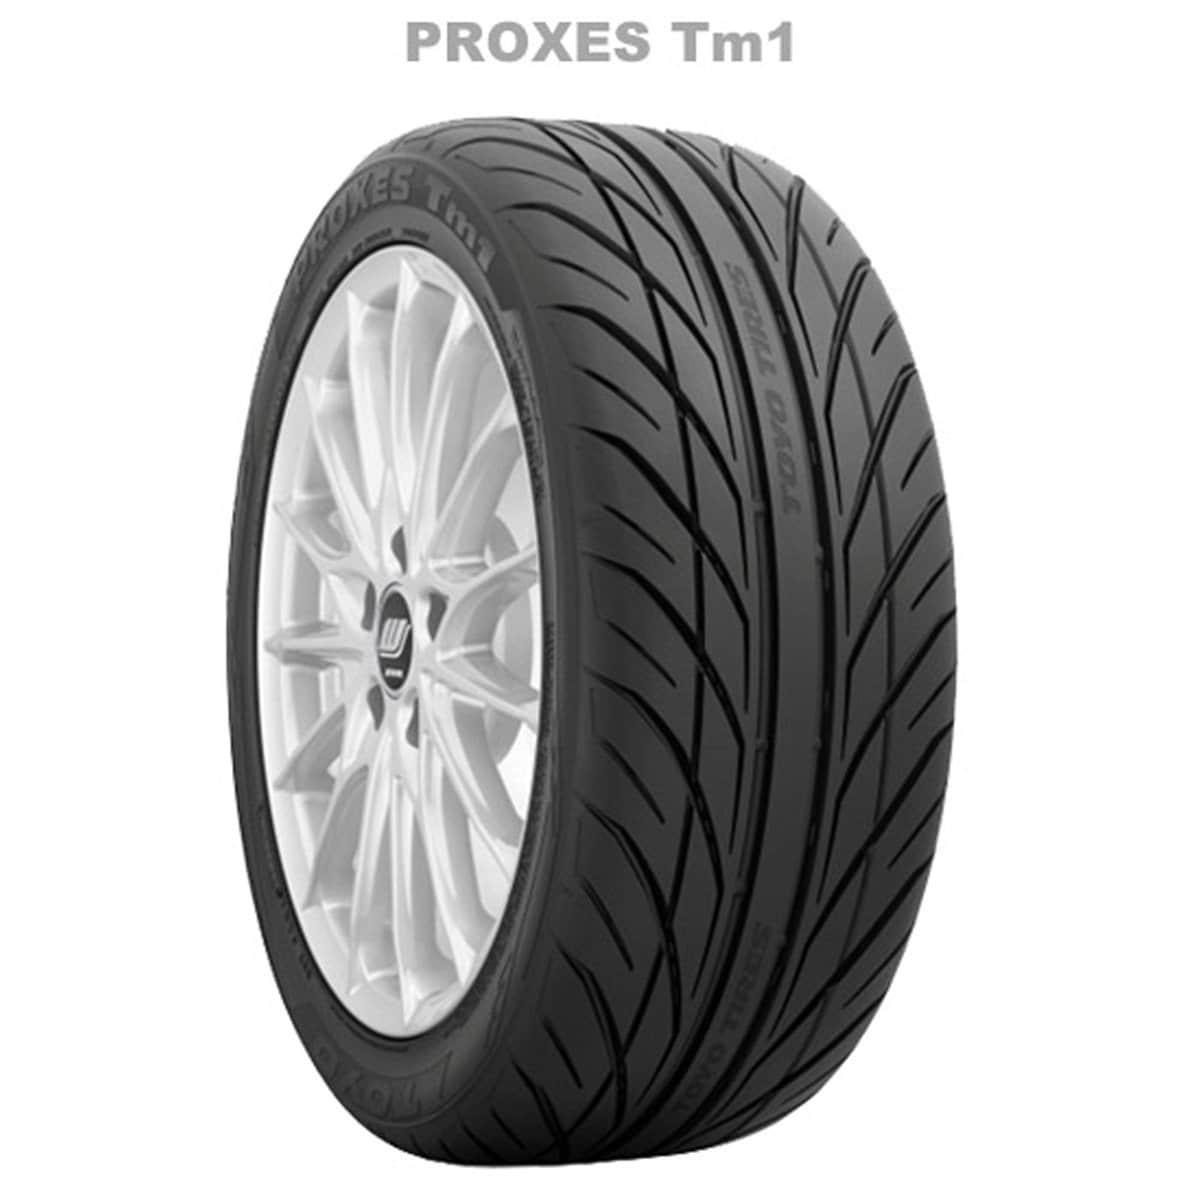 Llanta Toyo Tires Proxes Tm1 215 50 R17 95W